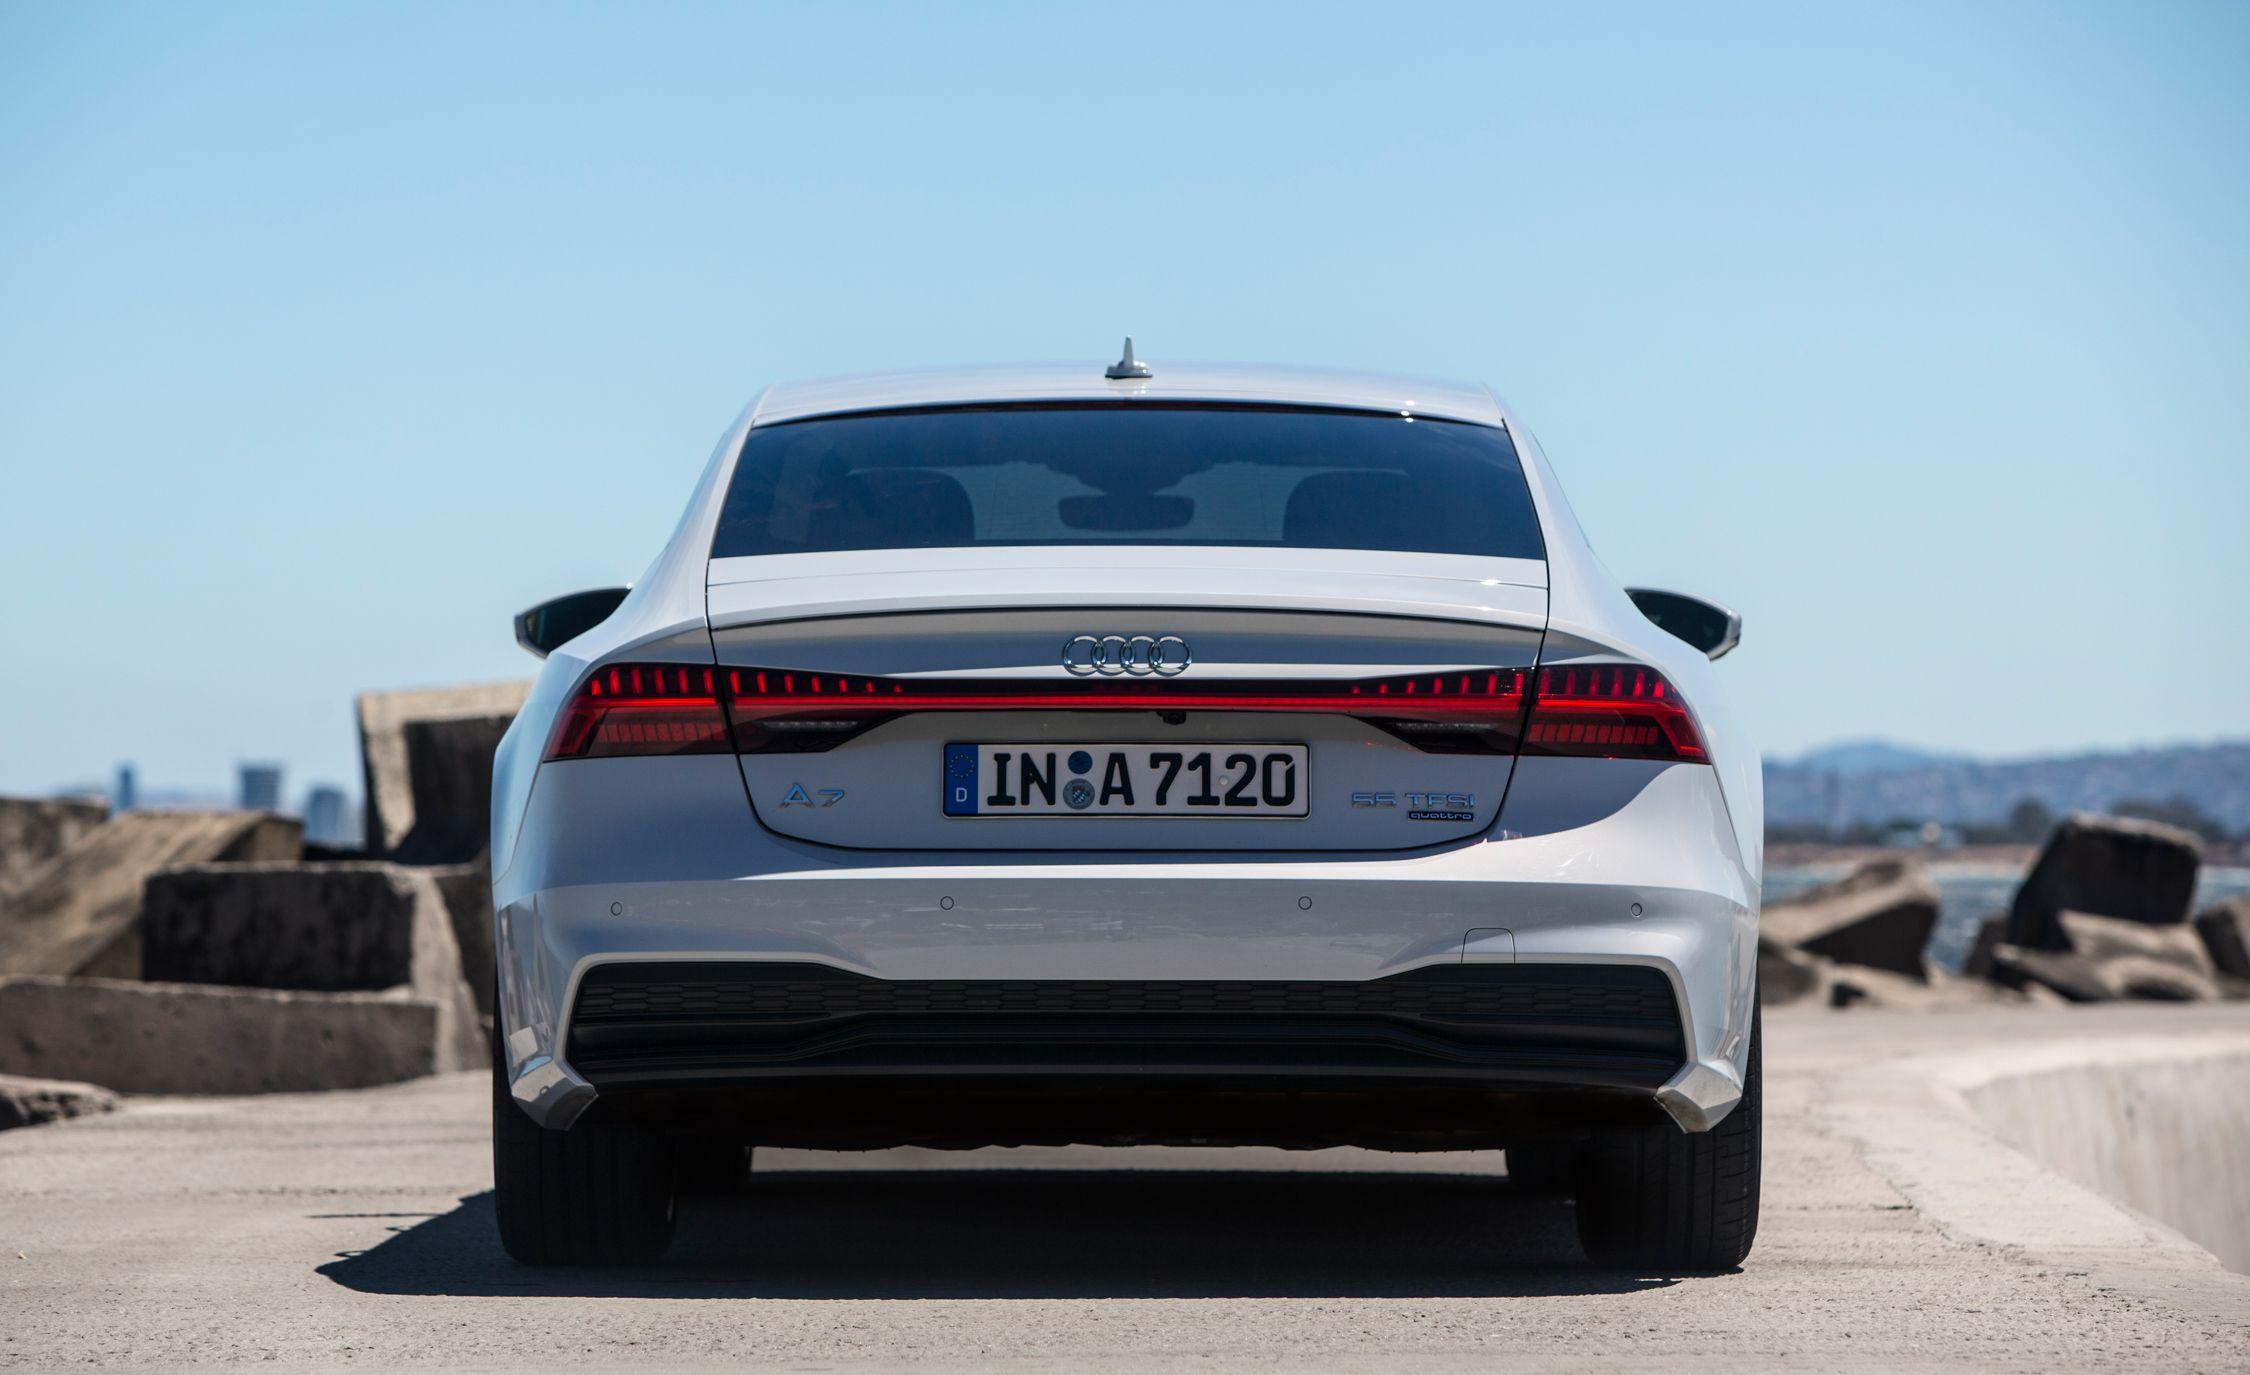 2019-Audi-A7-Sportback-206-1.jpg